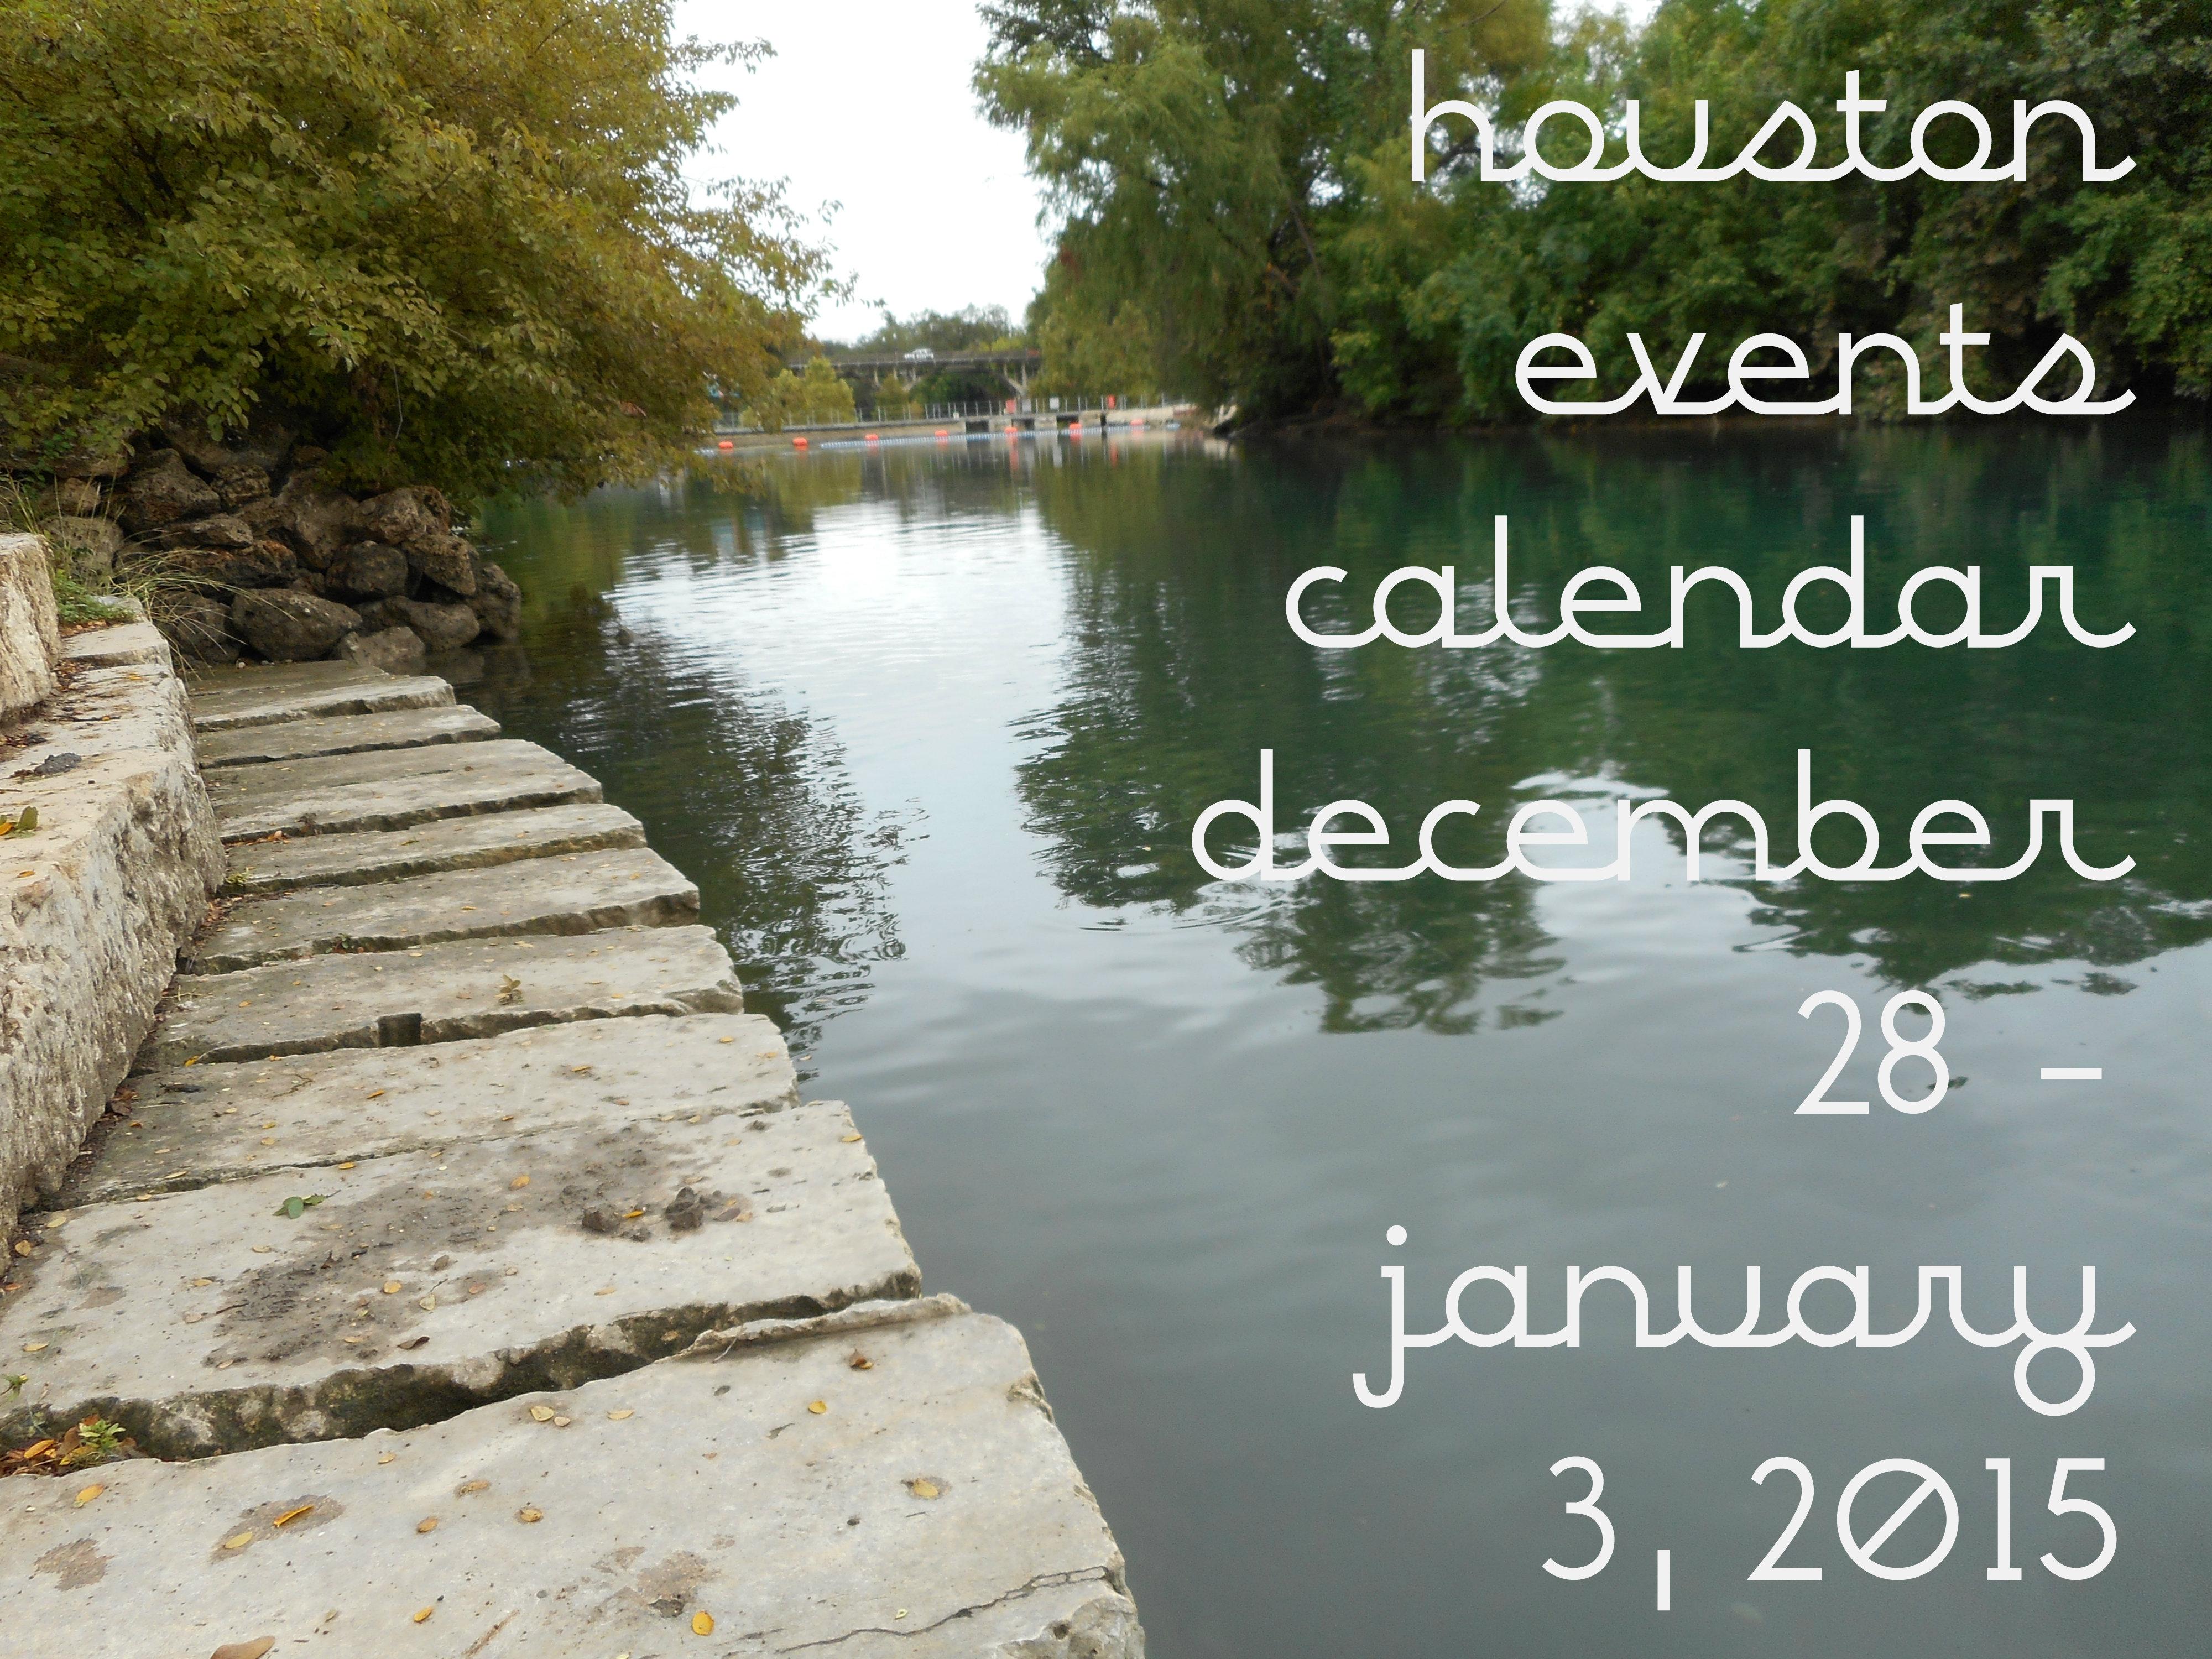 December 28 - January 3 - Mobil6000